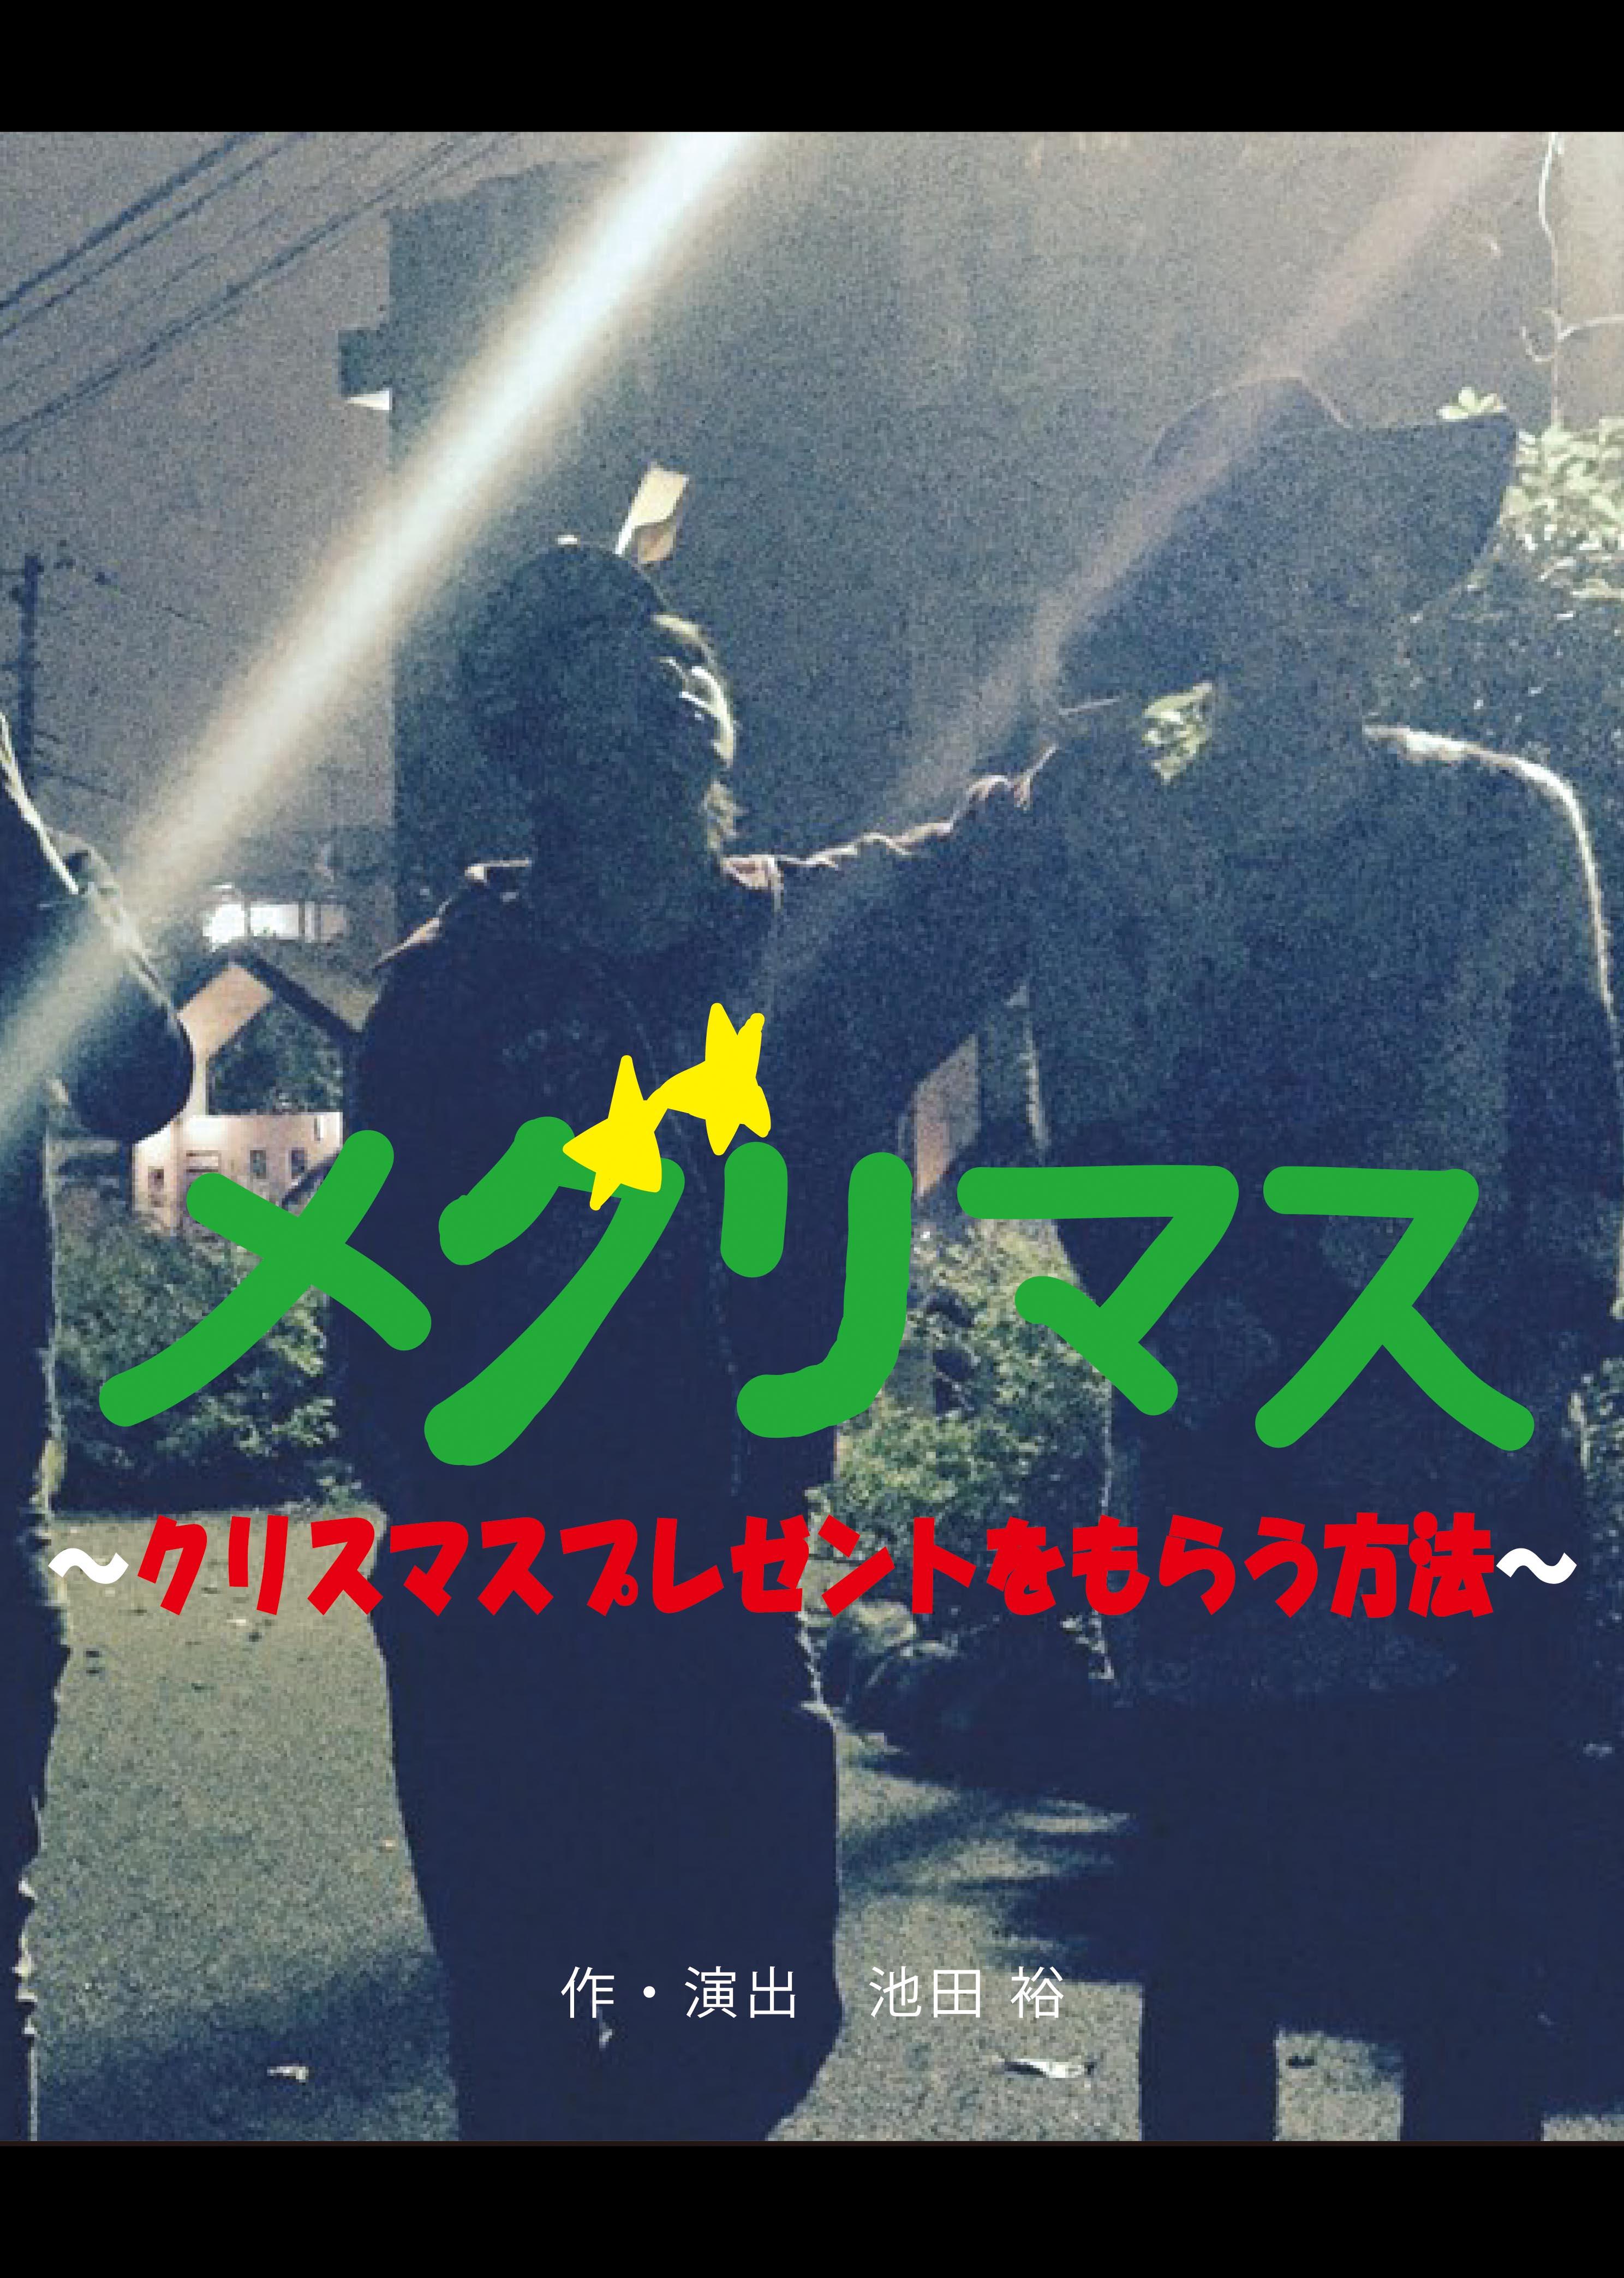 FPアドバンスプロデュース公演「メグリマス」〜クリスマスプレゼントをもらう 方法〜